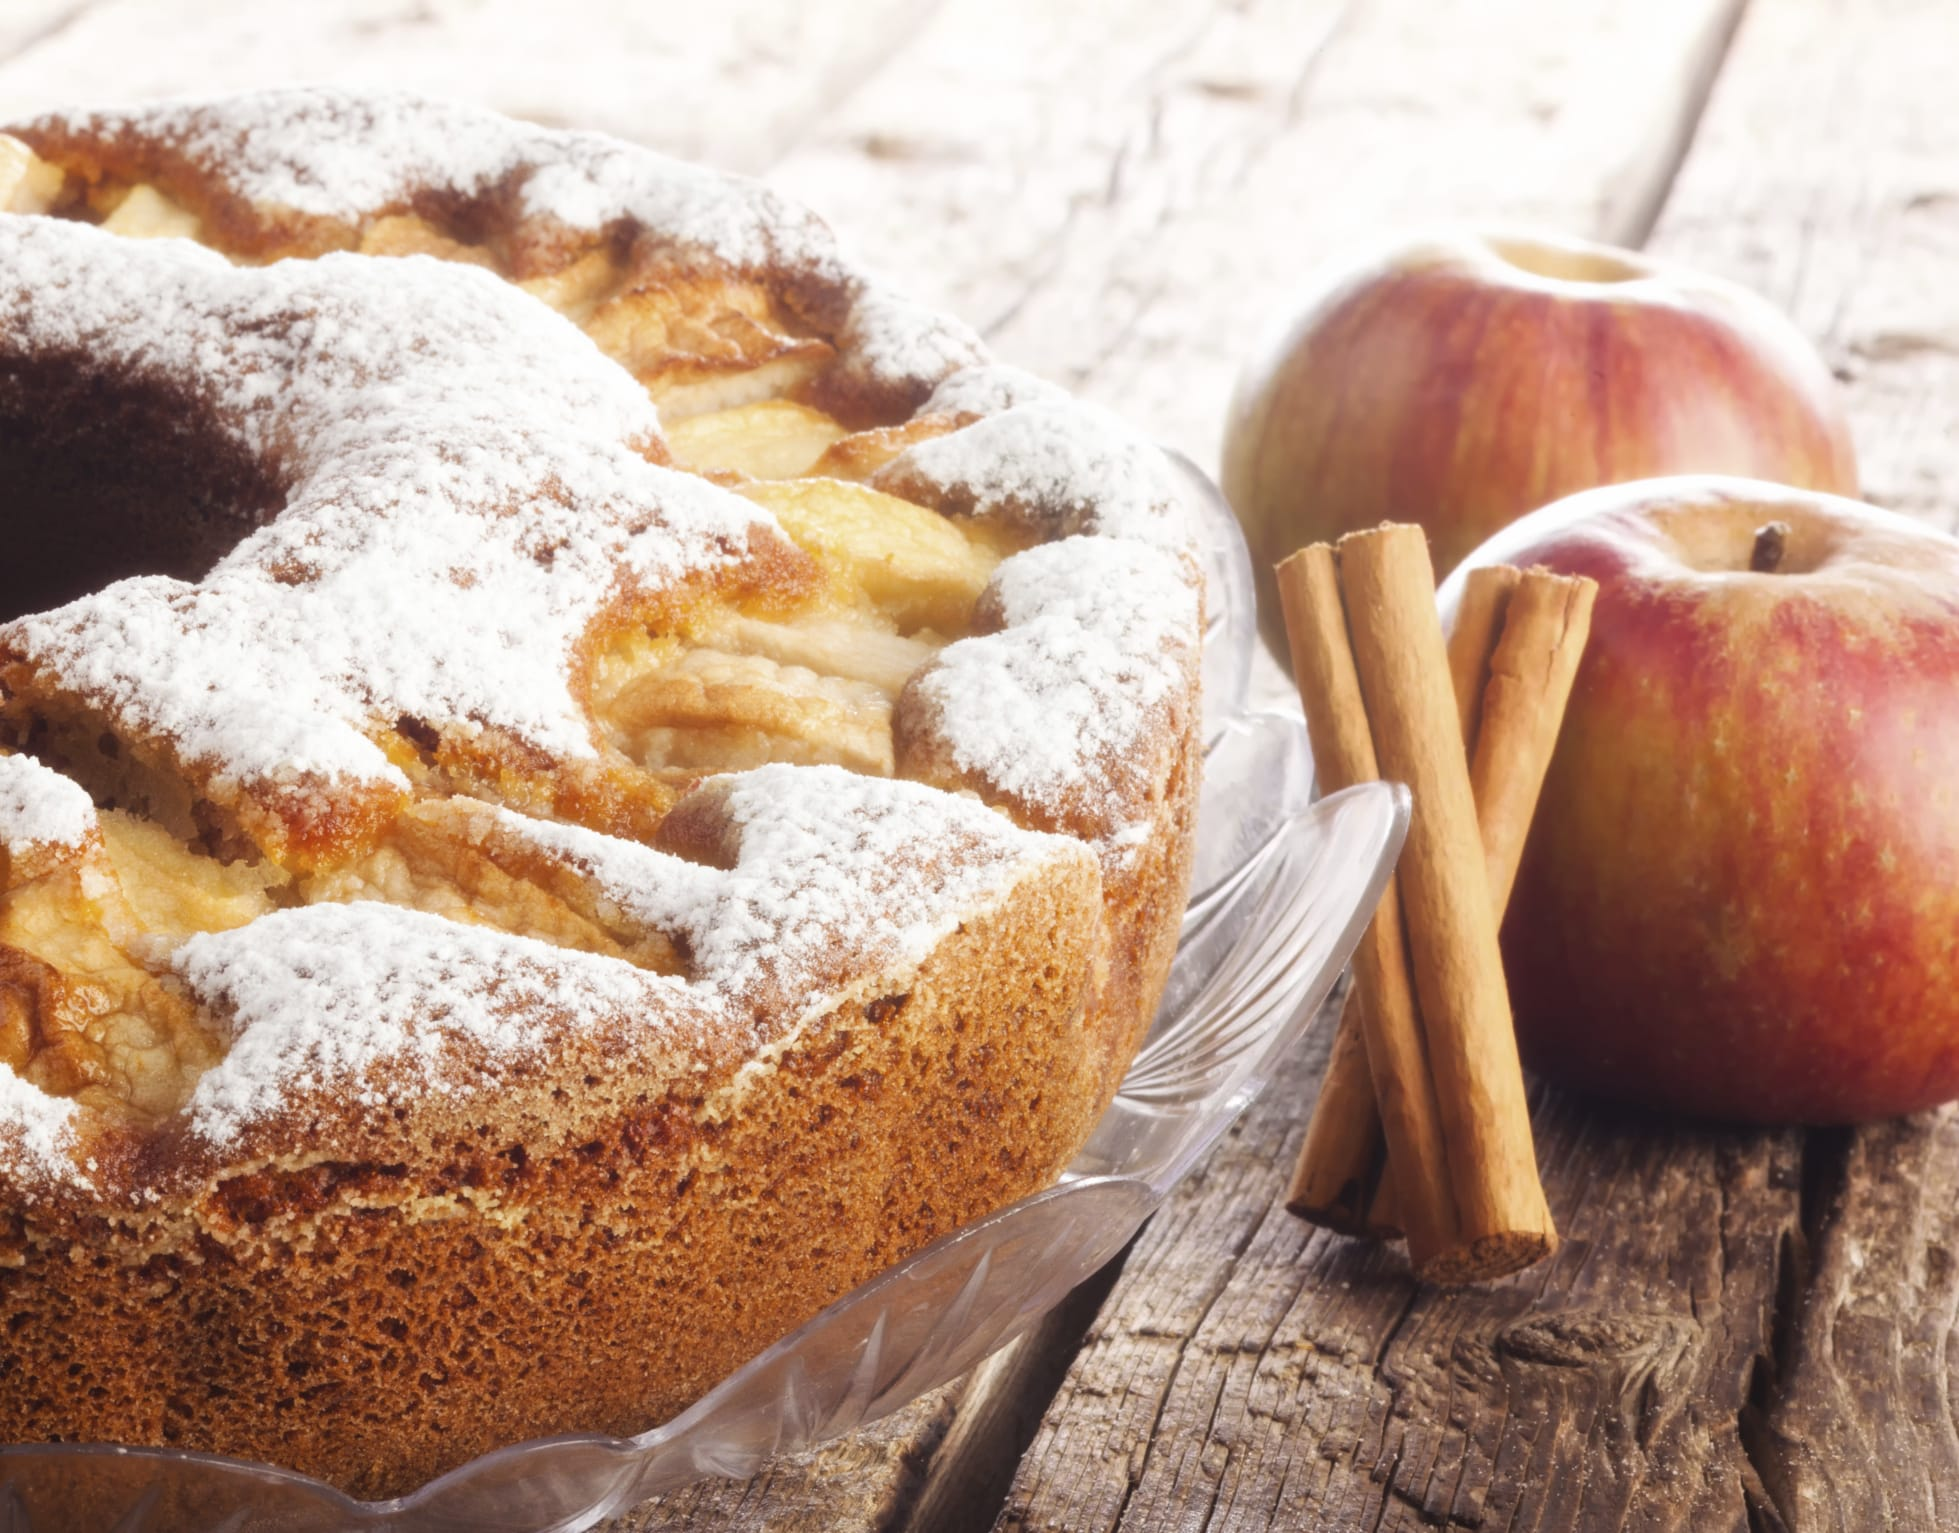 La ricetta del Pan di mela